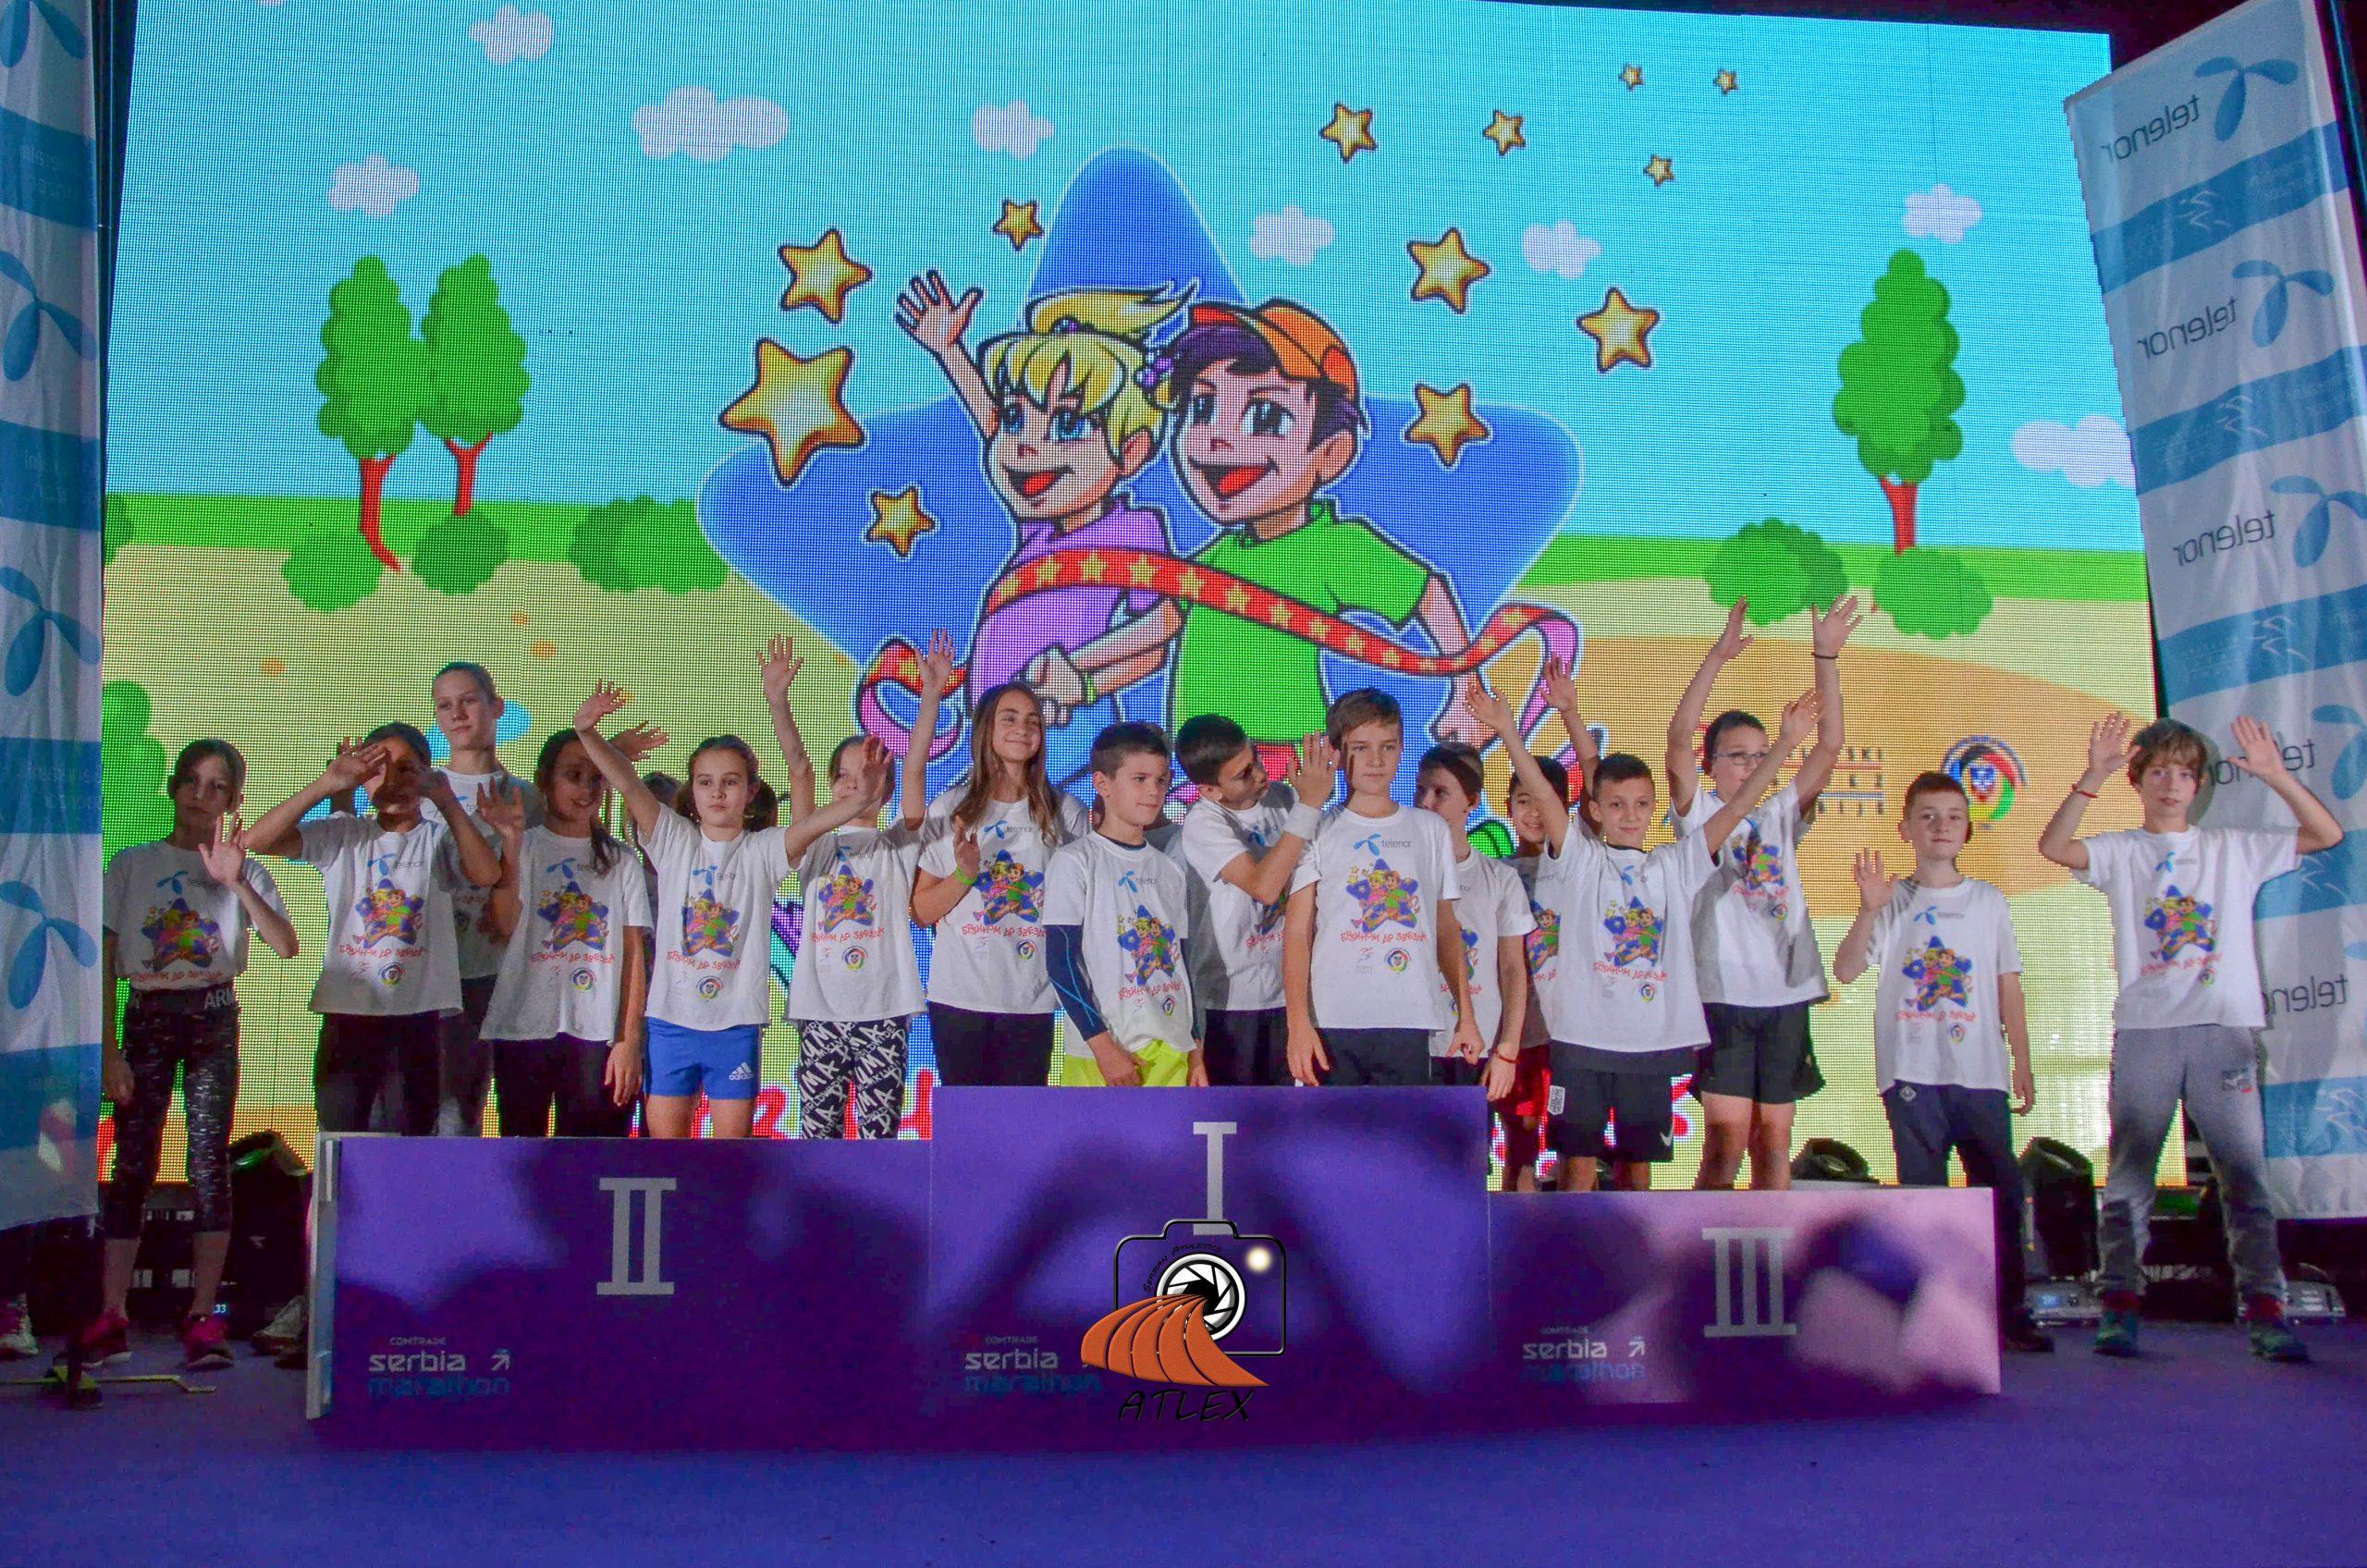 Finalisti ''Brzinom do zvezda'' Beograd